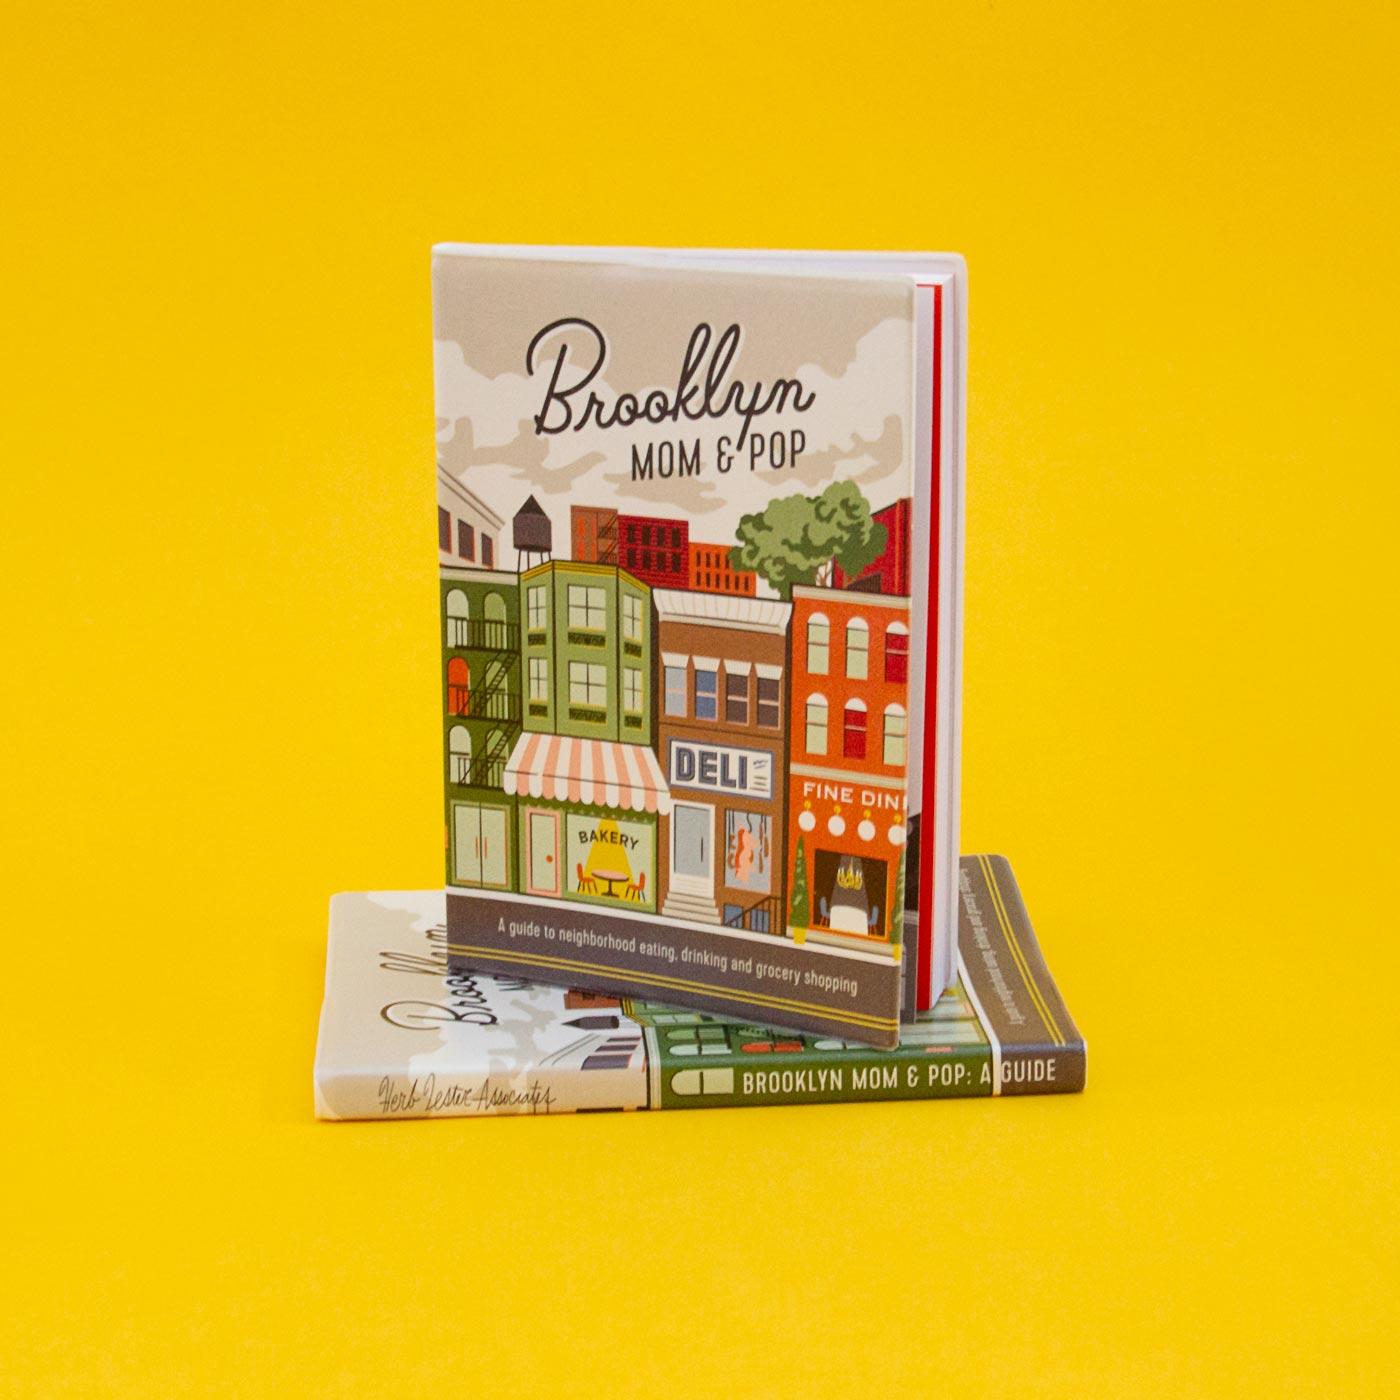 """Brooklyn Mom & Pop: A Guide"" - Herb Lester Illustrations by Hoodzpah"